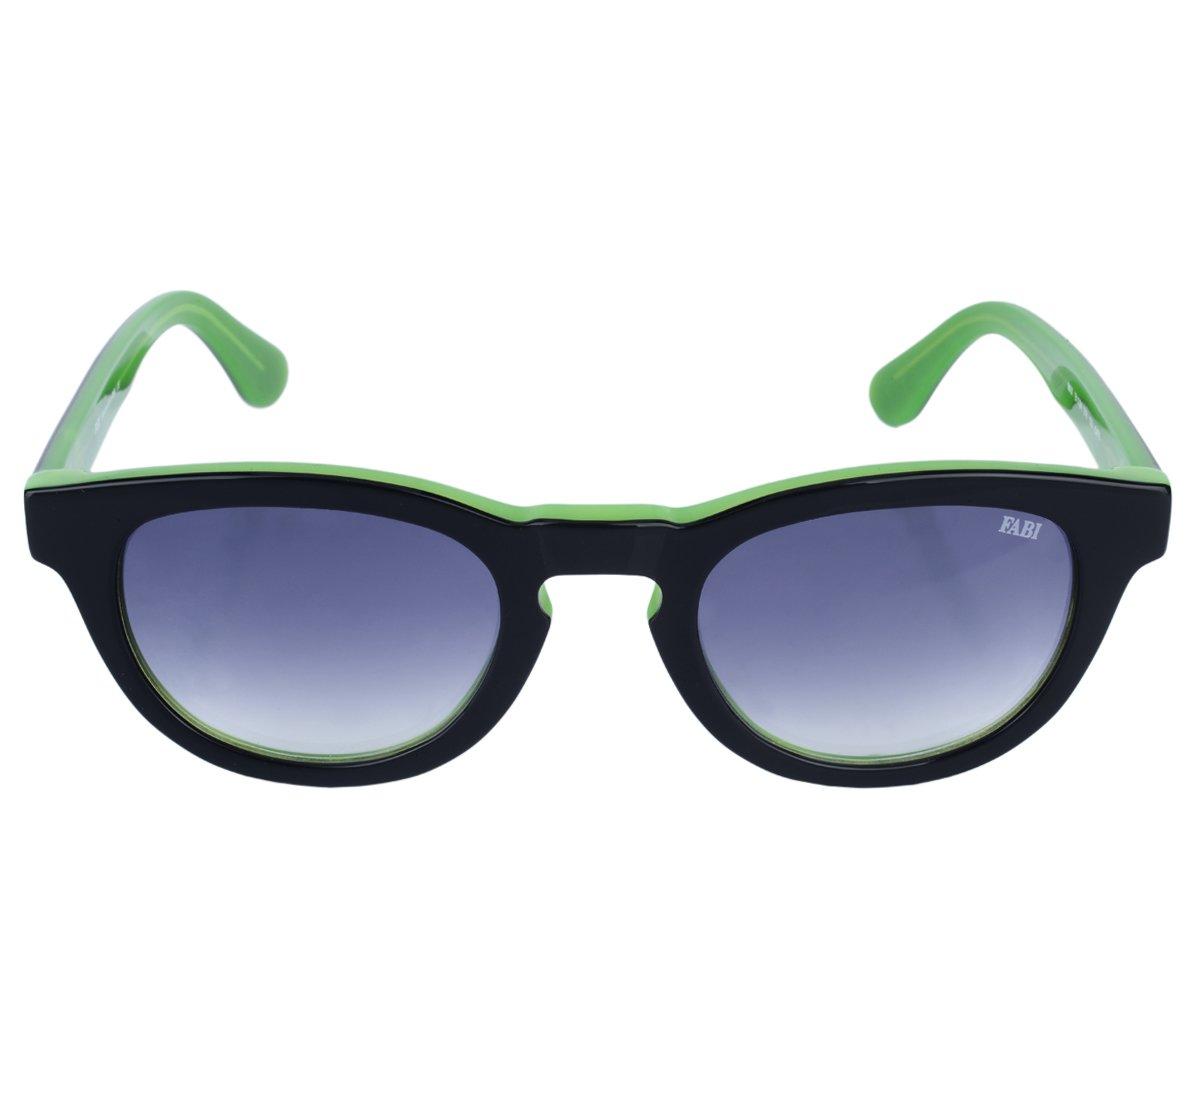 Occhiale Max verde